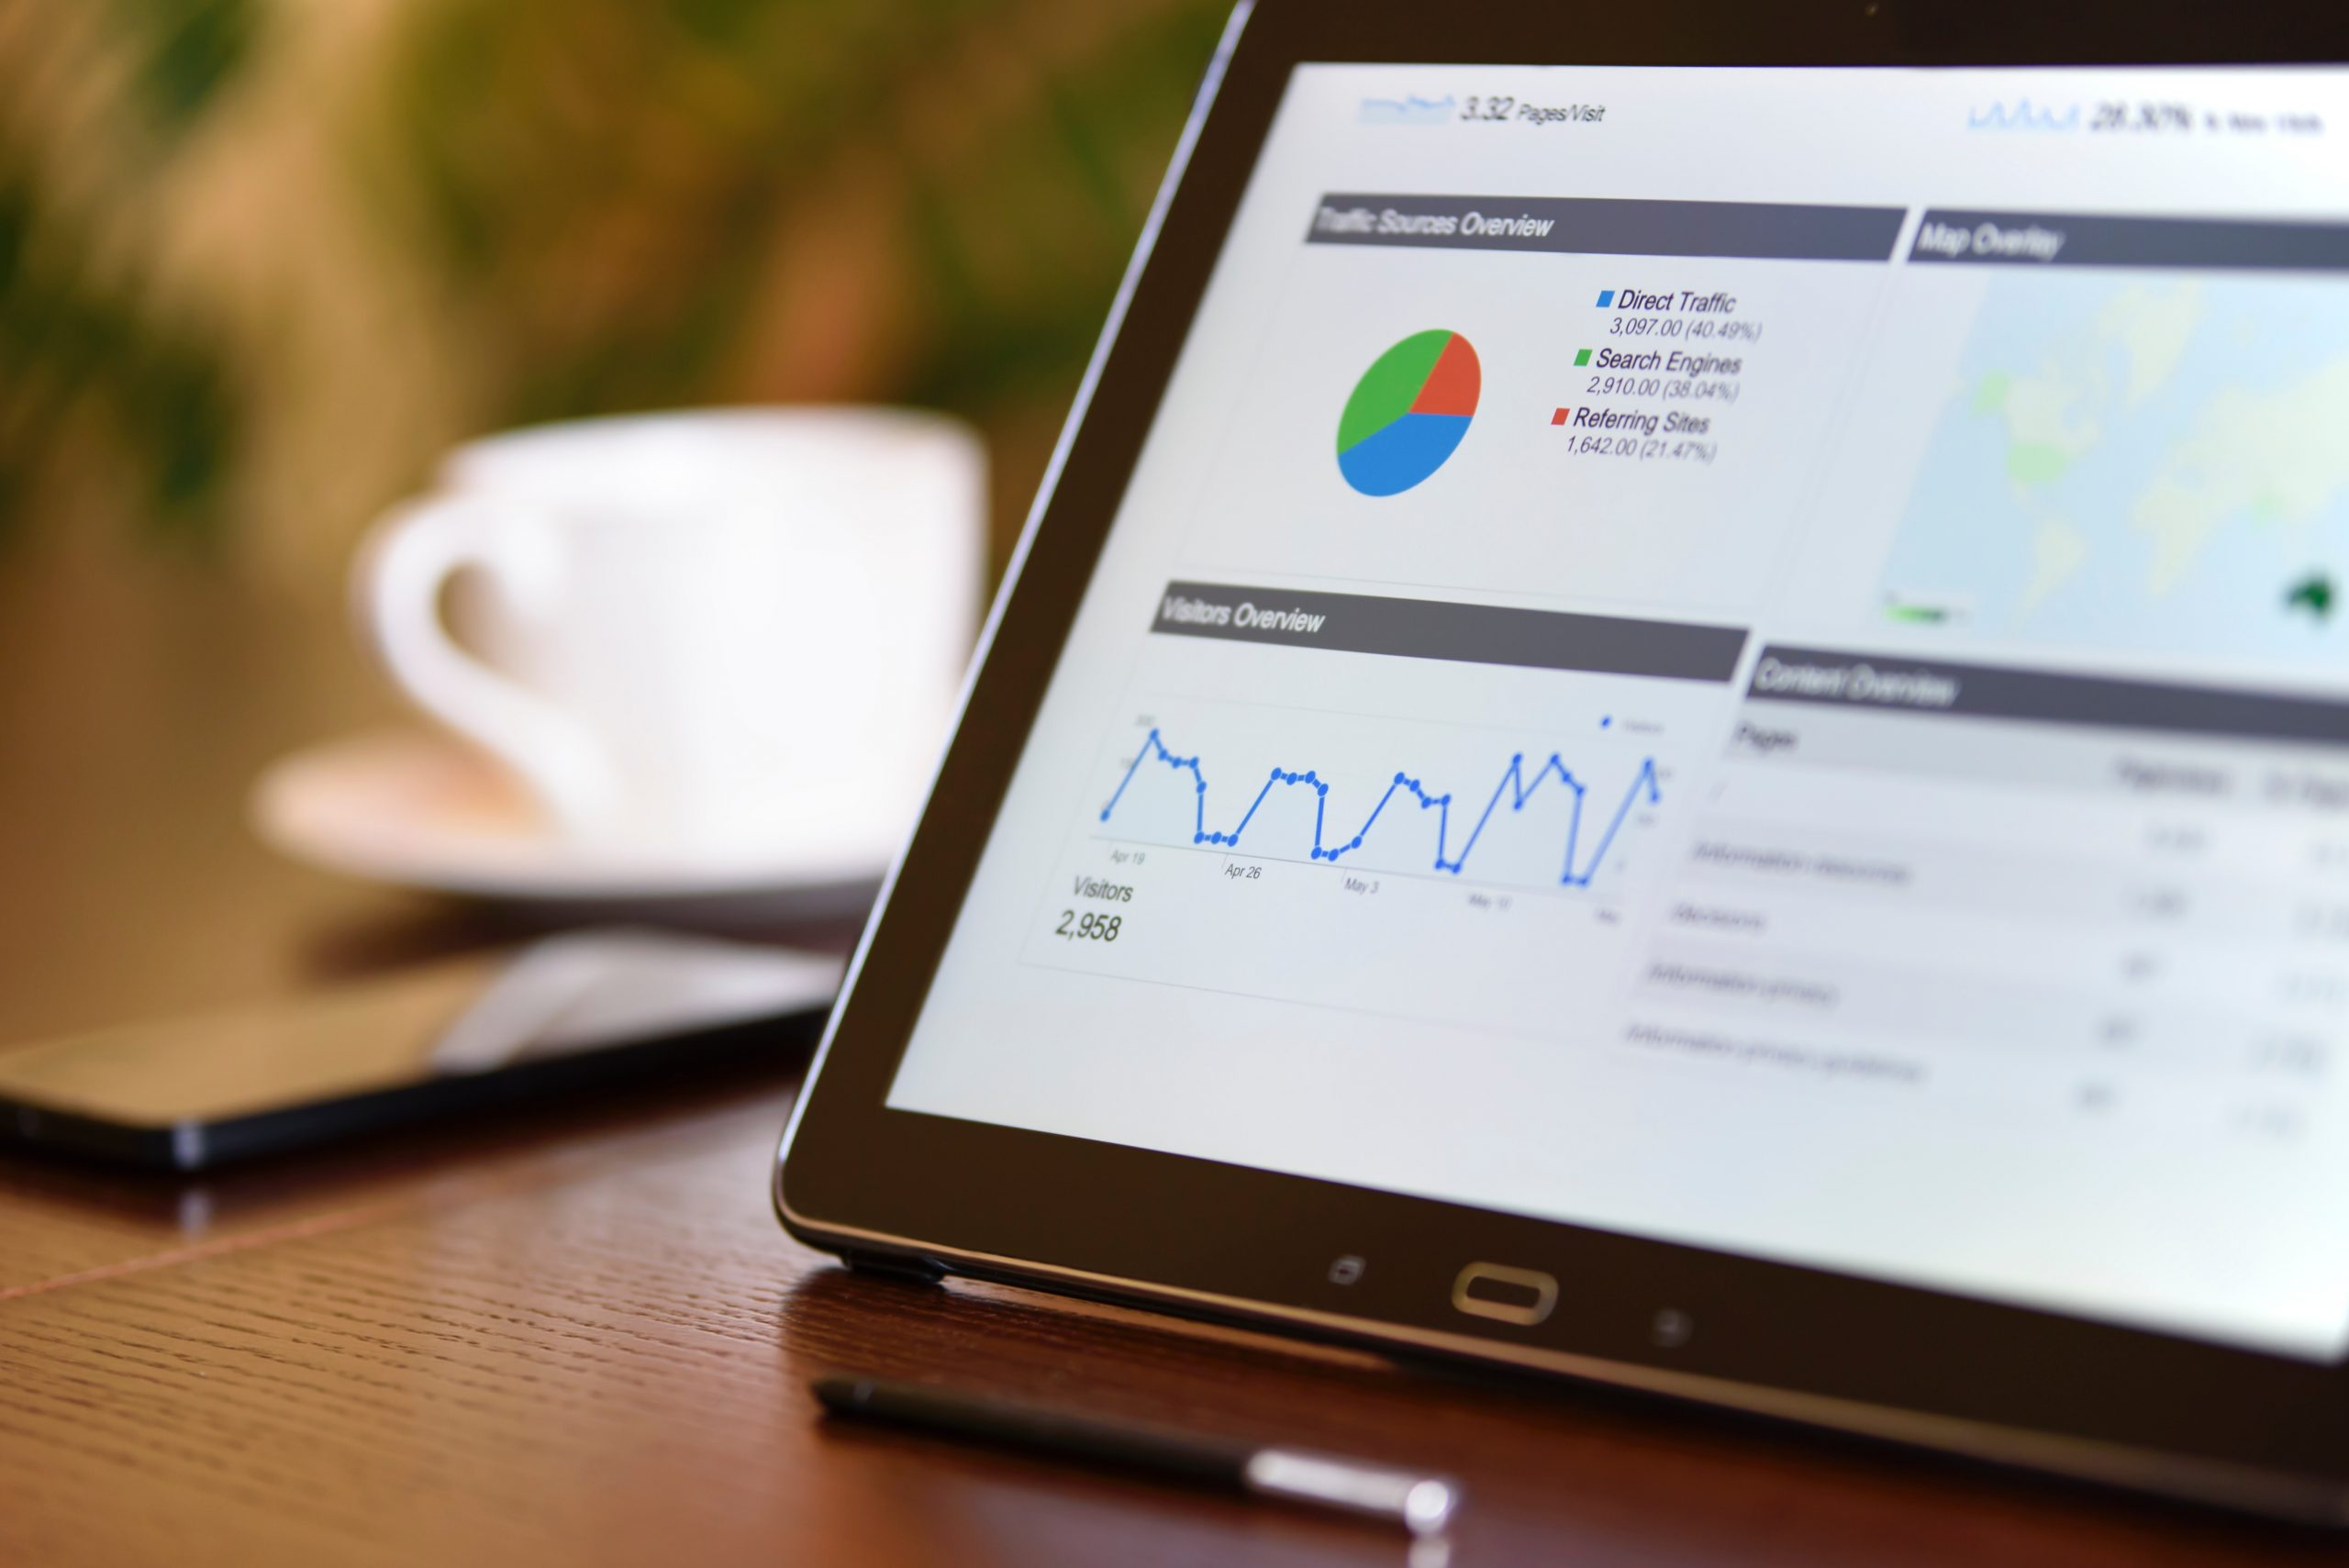 Google adwords data on ipad